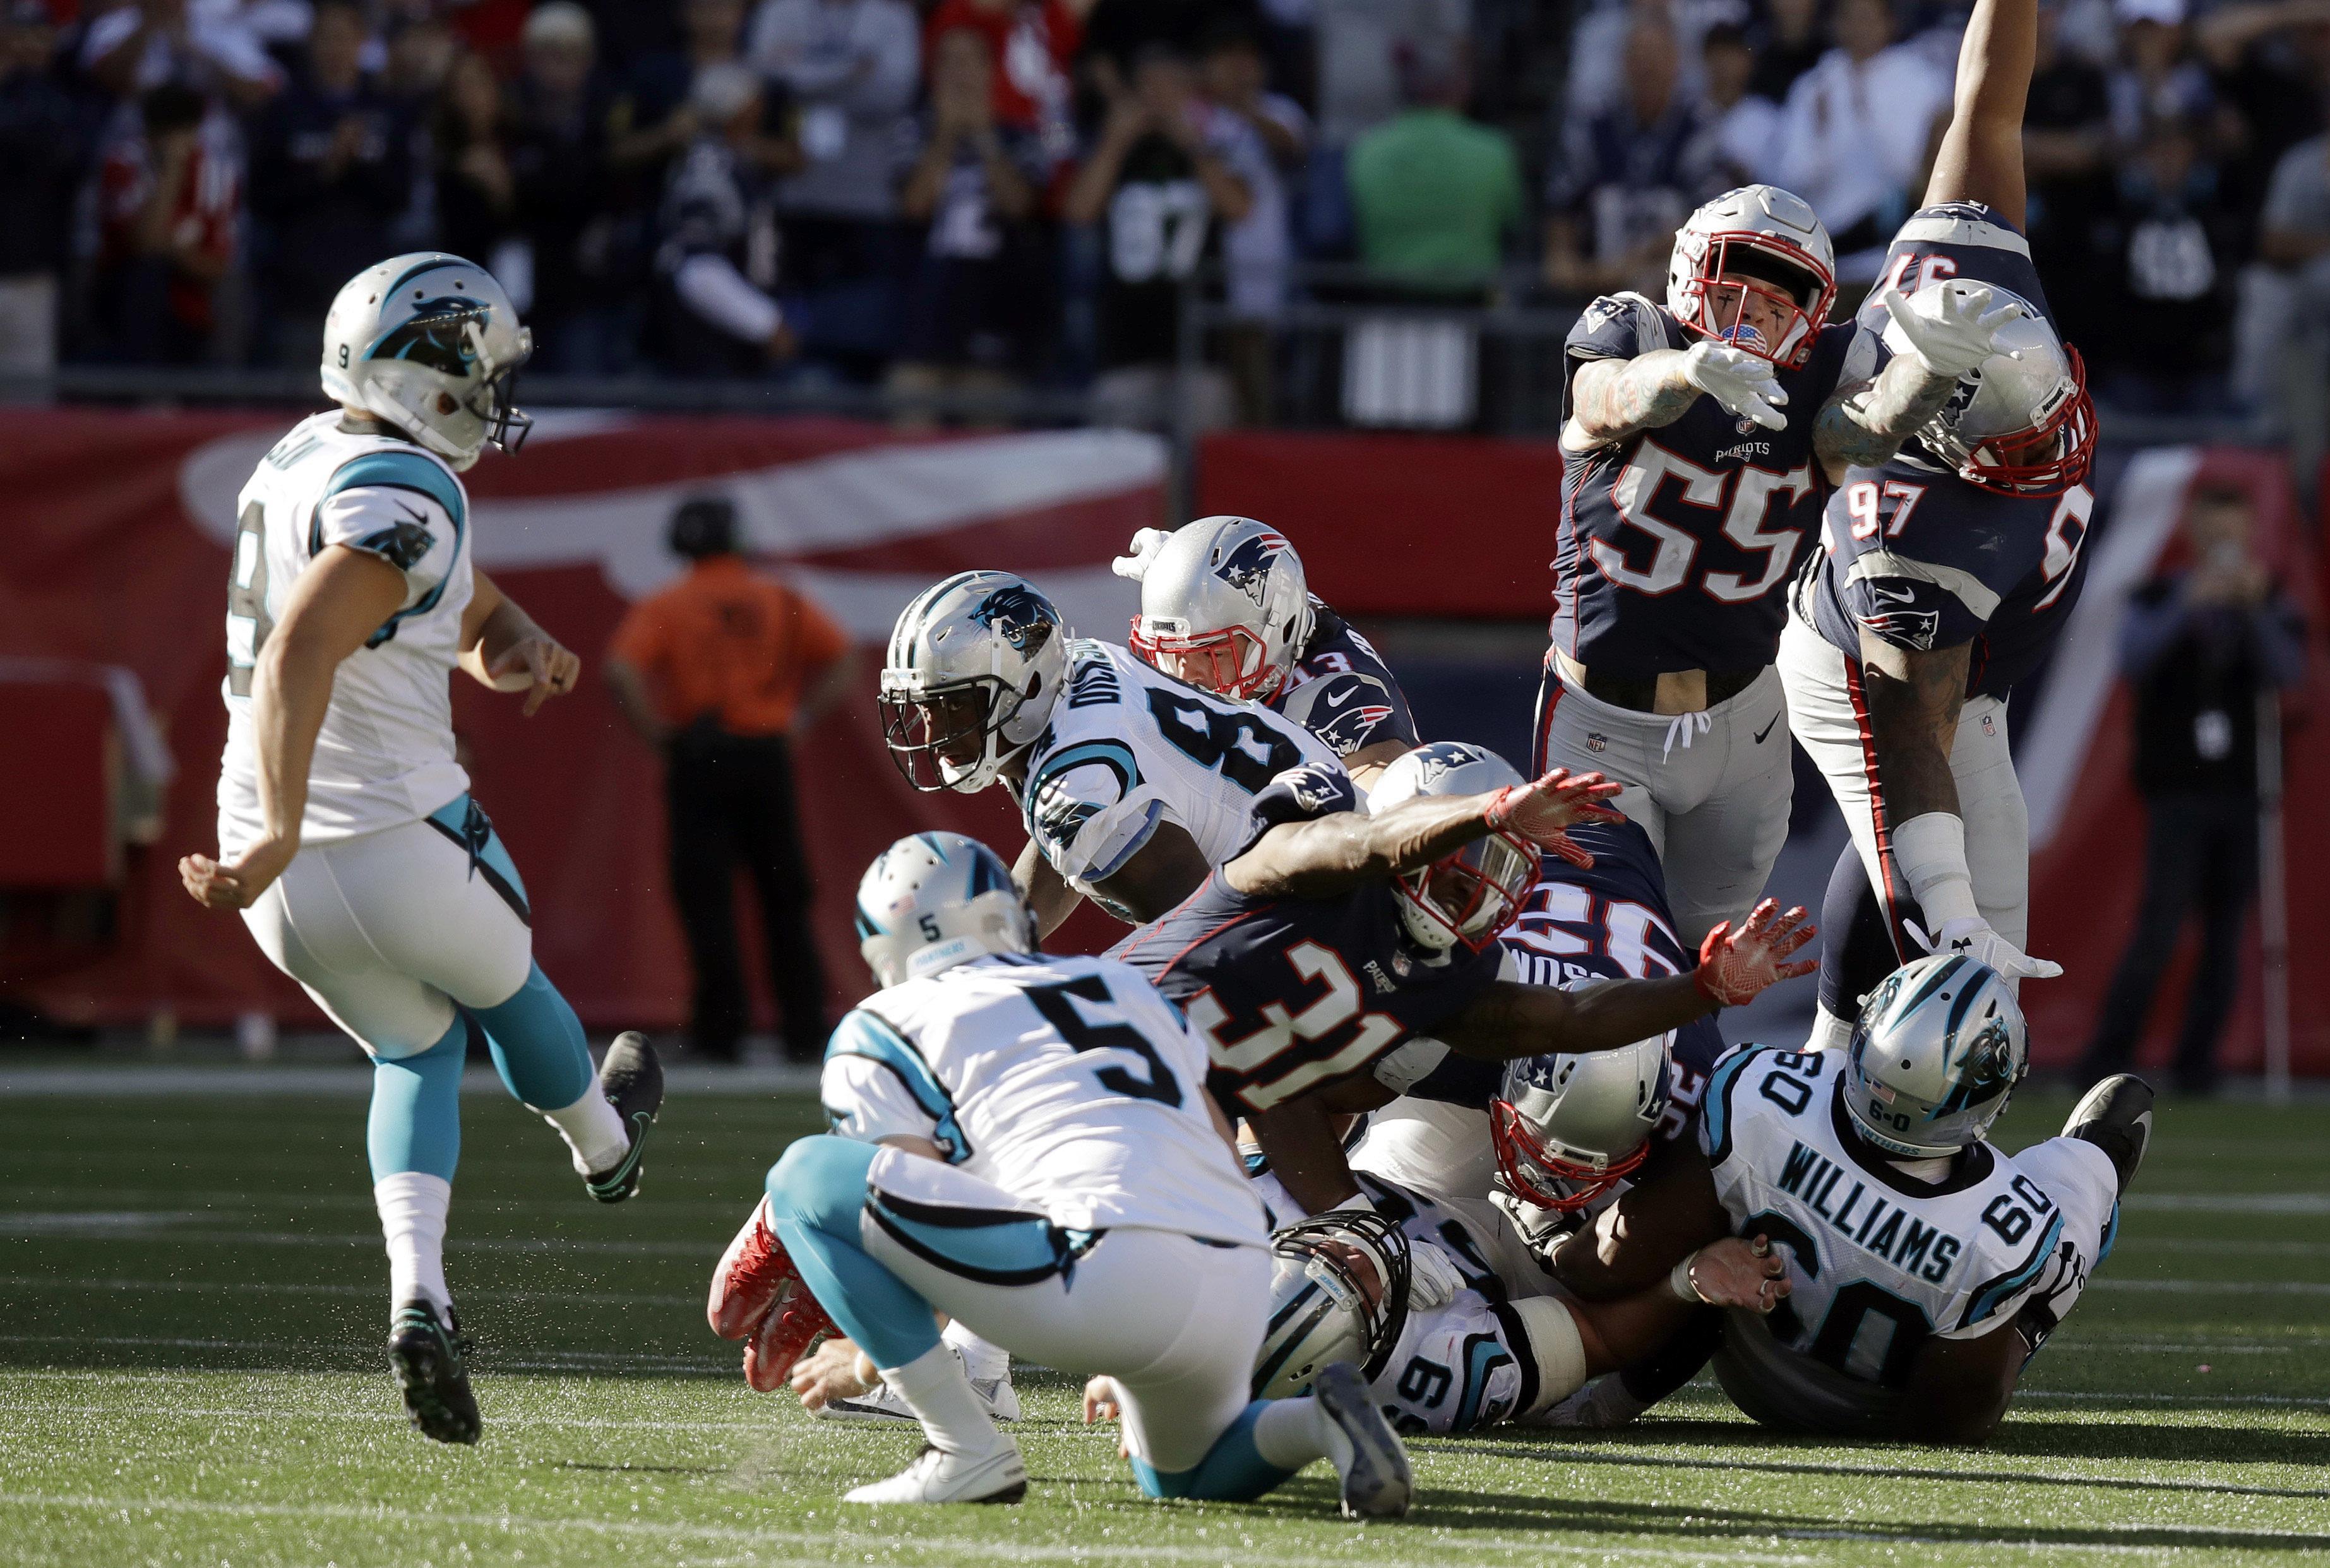 on sale 4b078 023d8 Carolina Panthers kicker Graham Gano, left, kicks the game-winning field  goal as